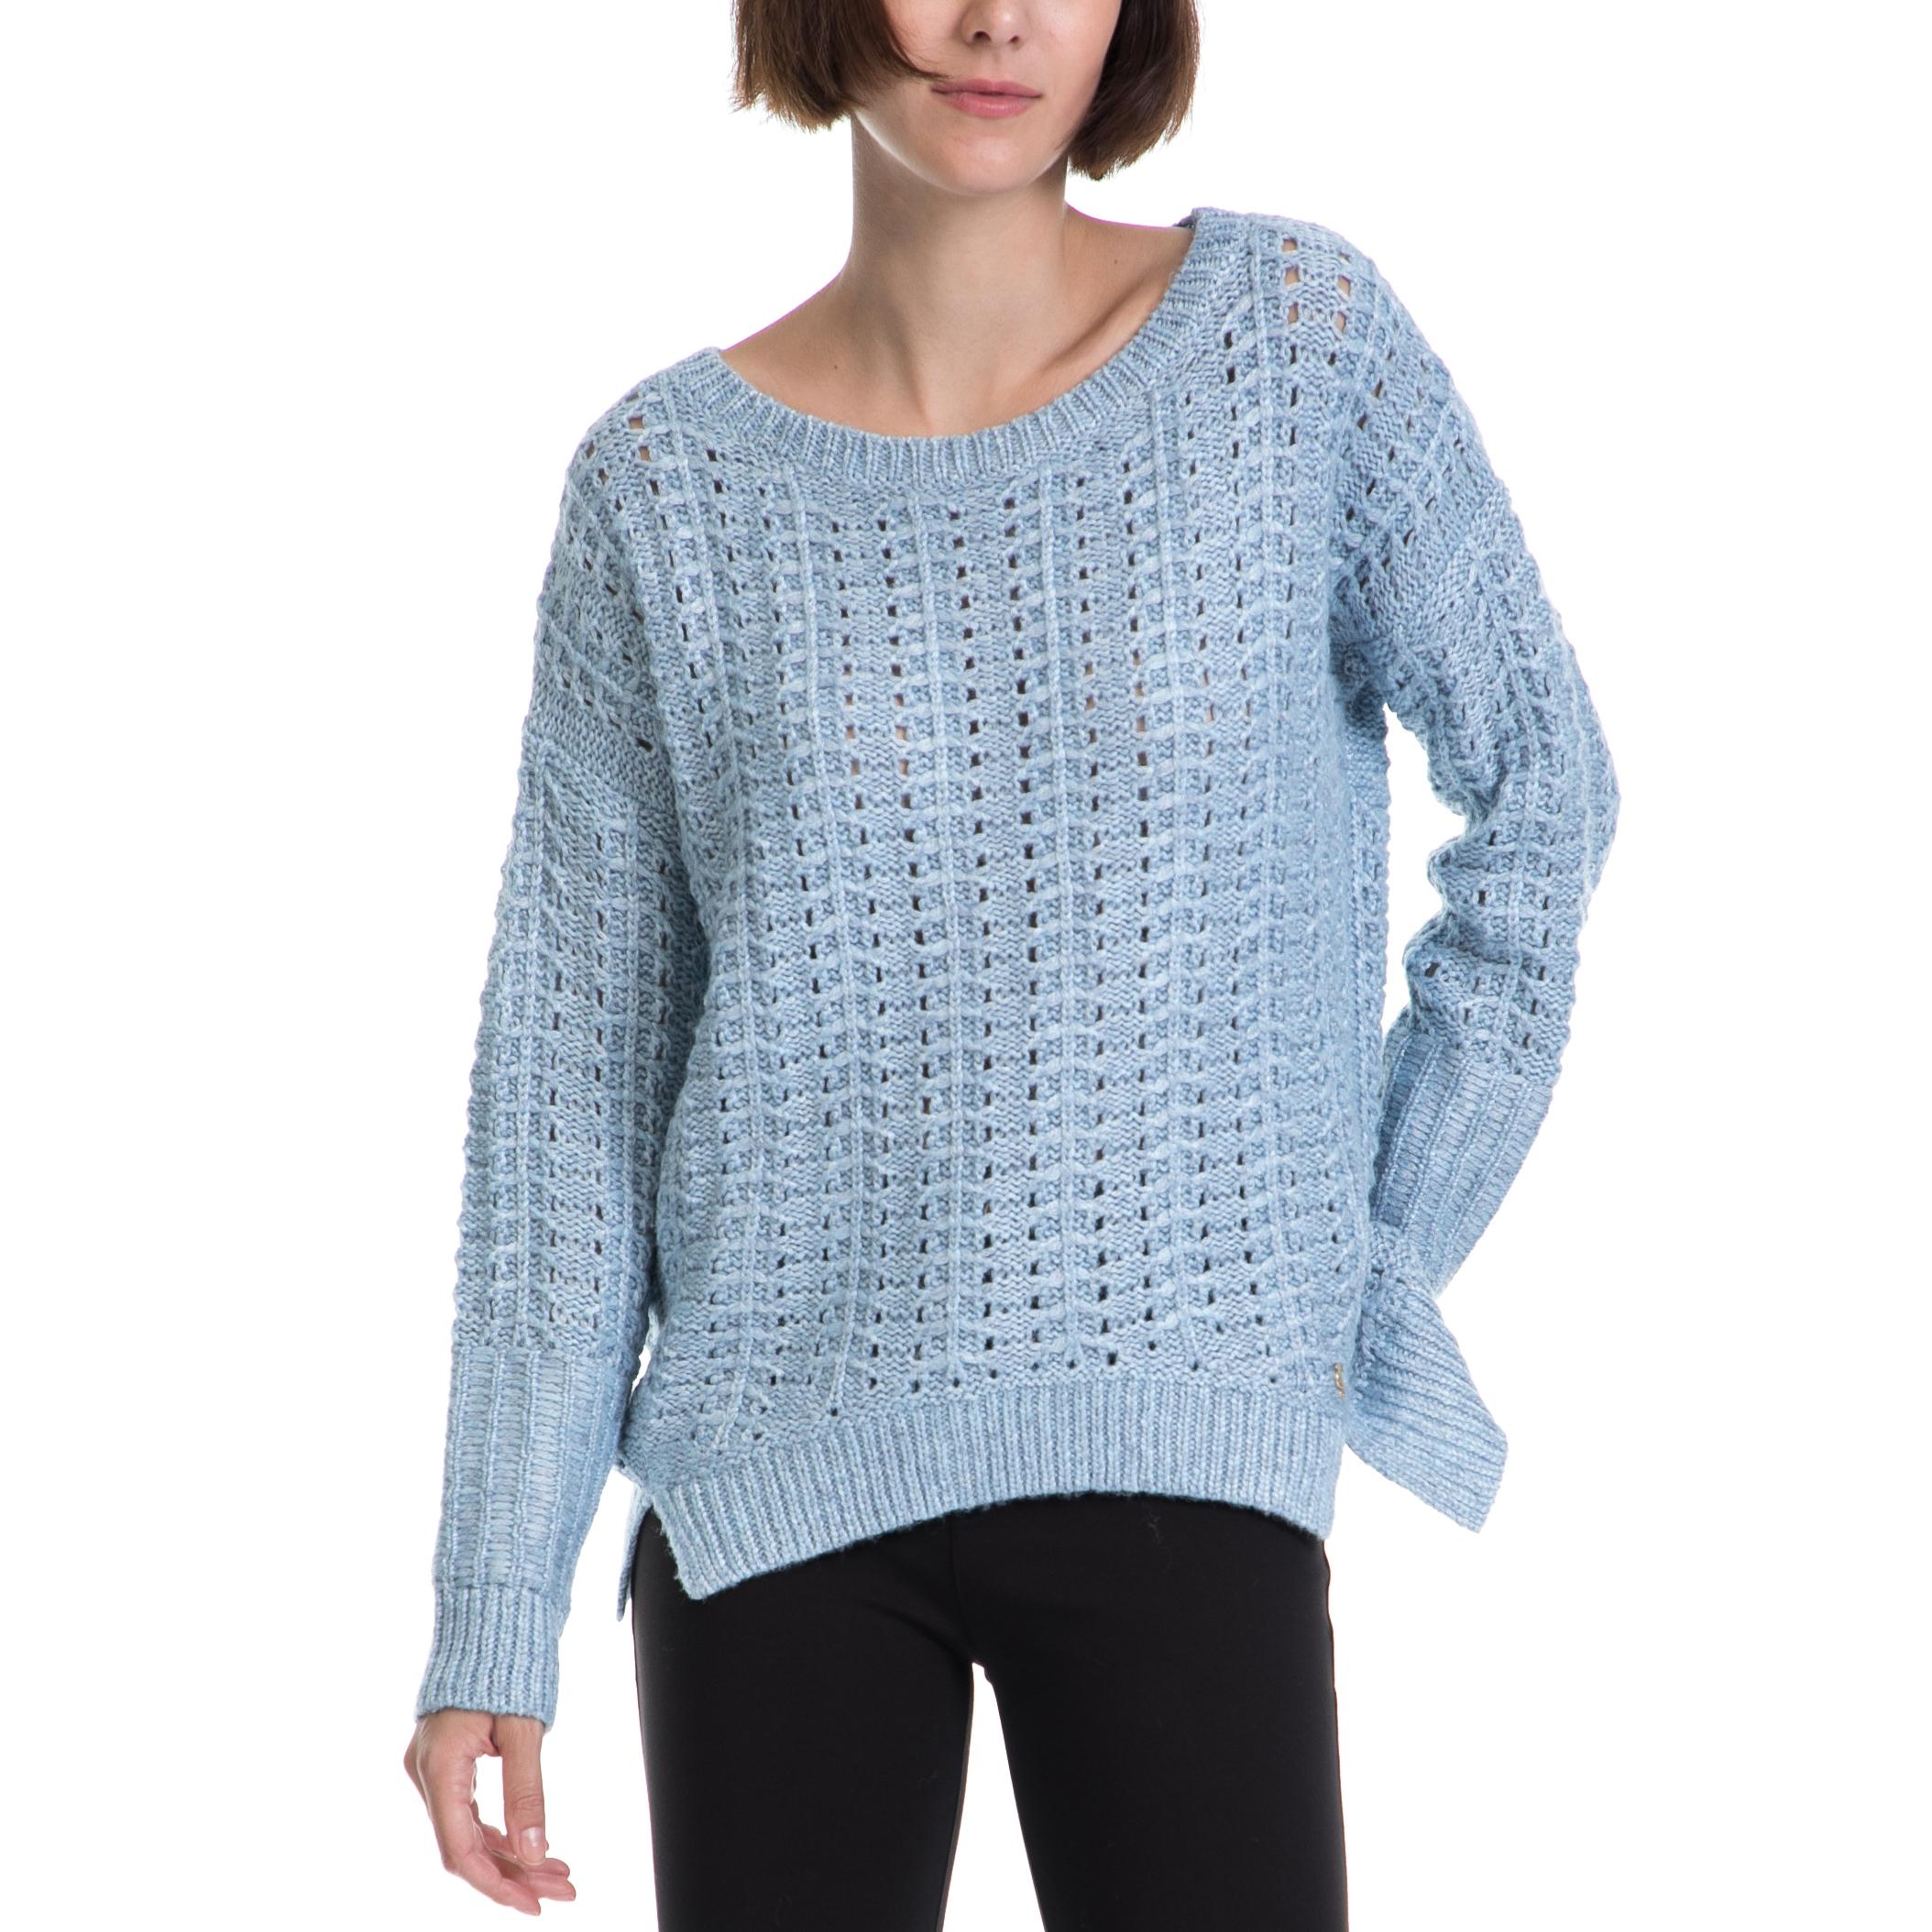 c221c07fddf6 JUICY COUTURE – Γυναικείο πουλόβερ JUICY COUTURE μπλε